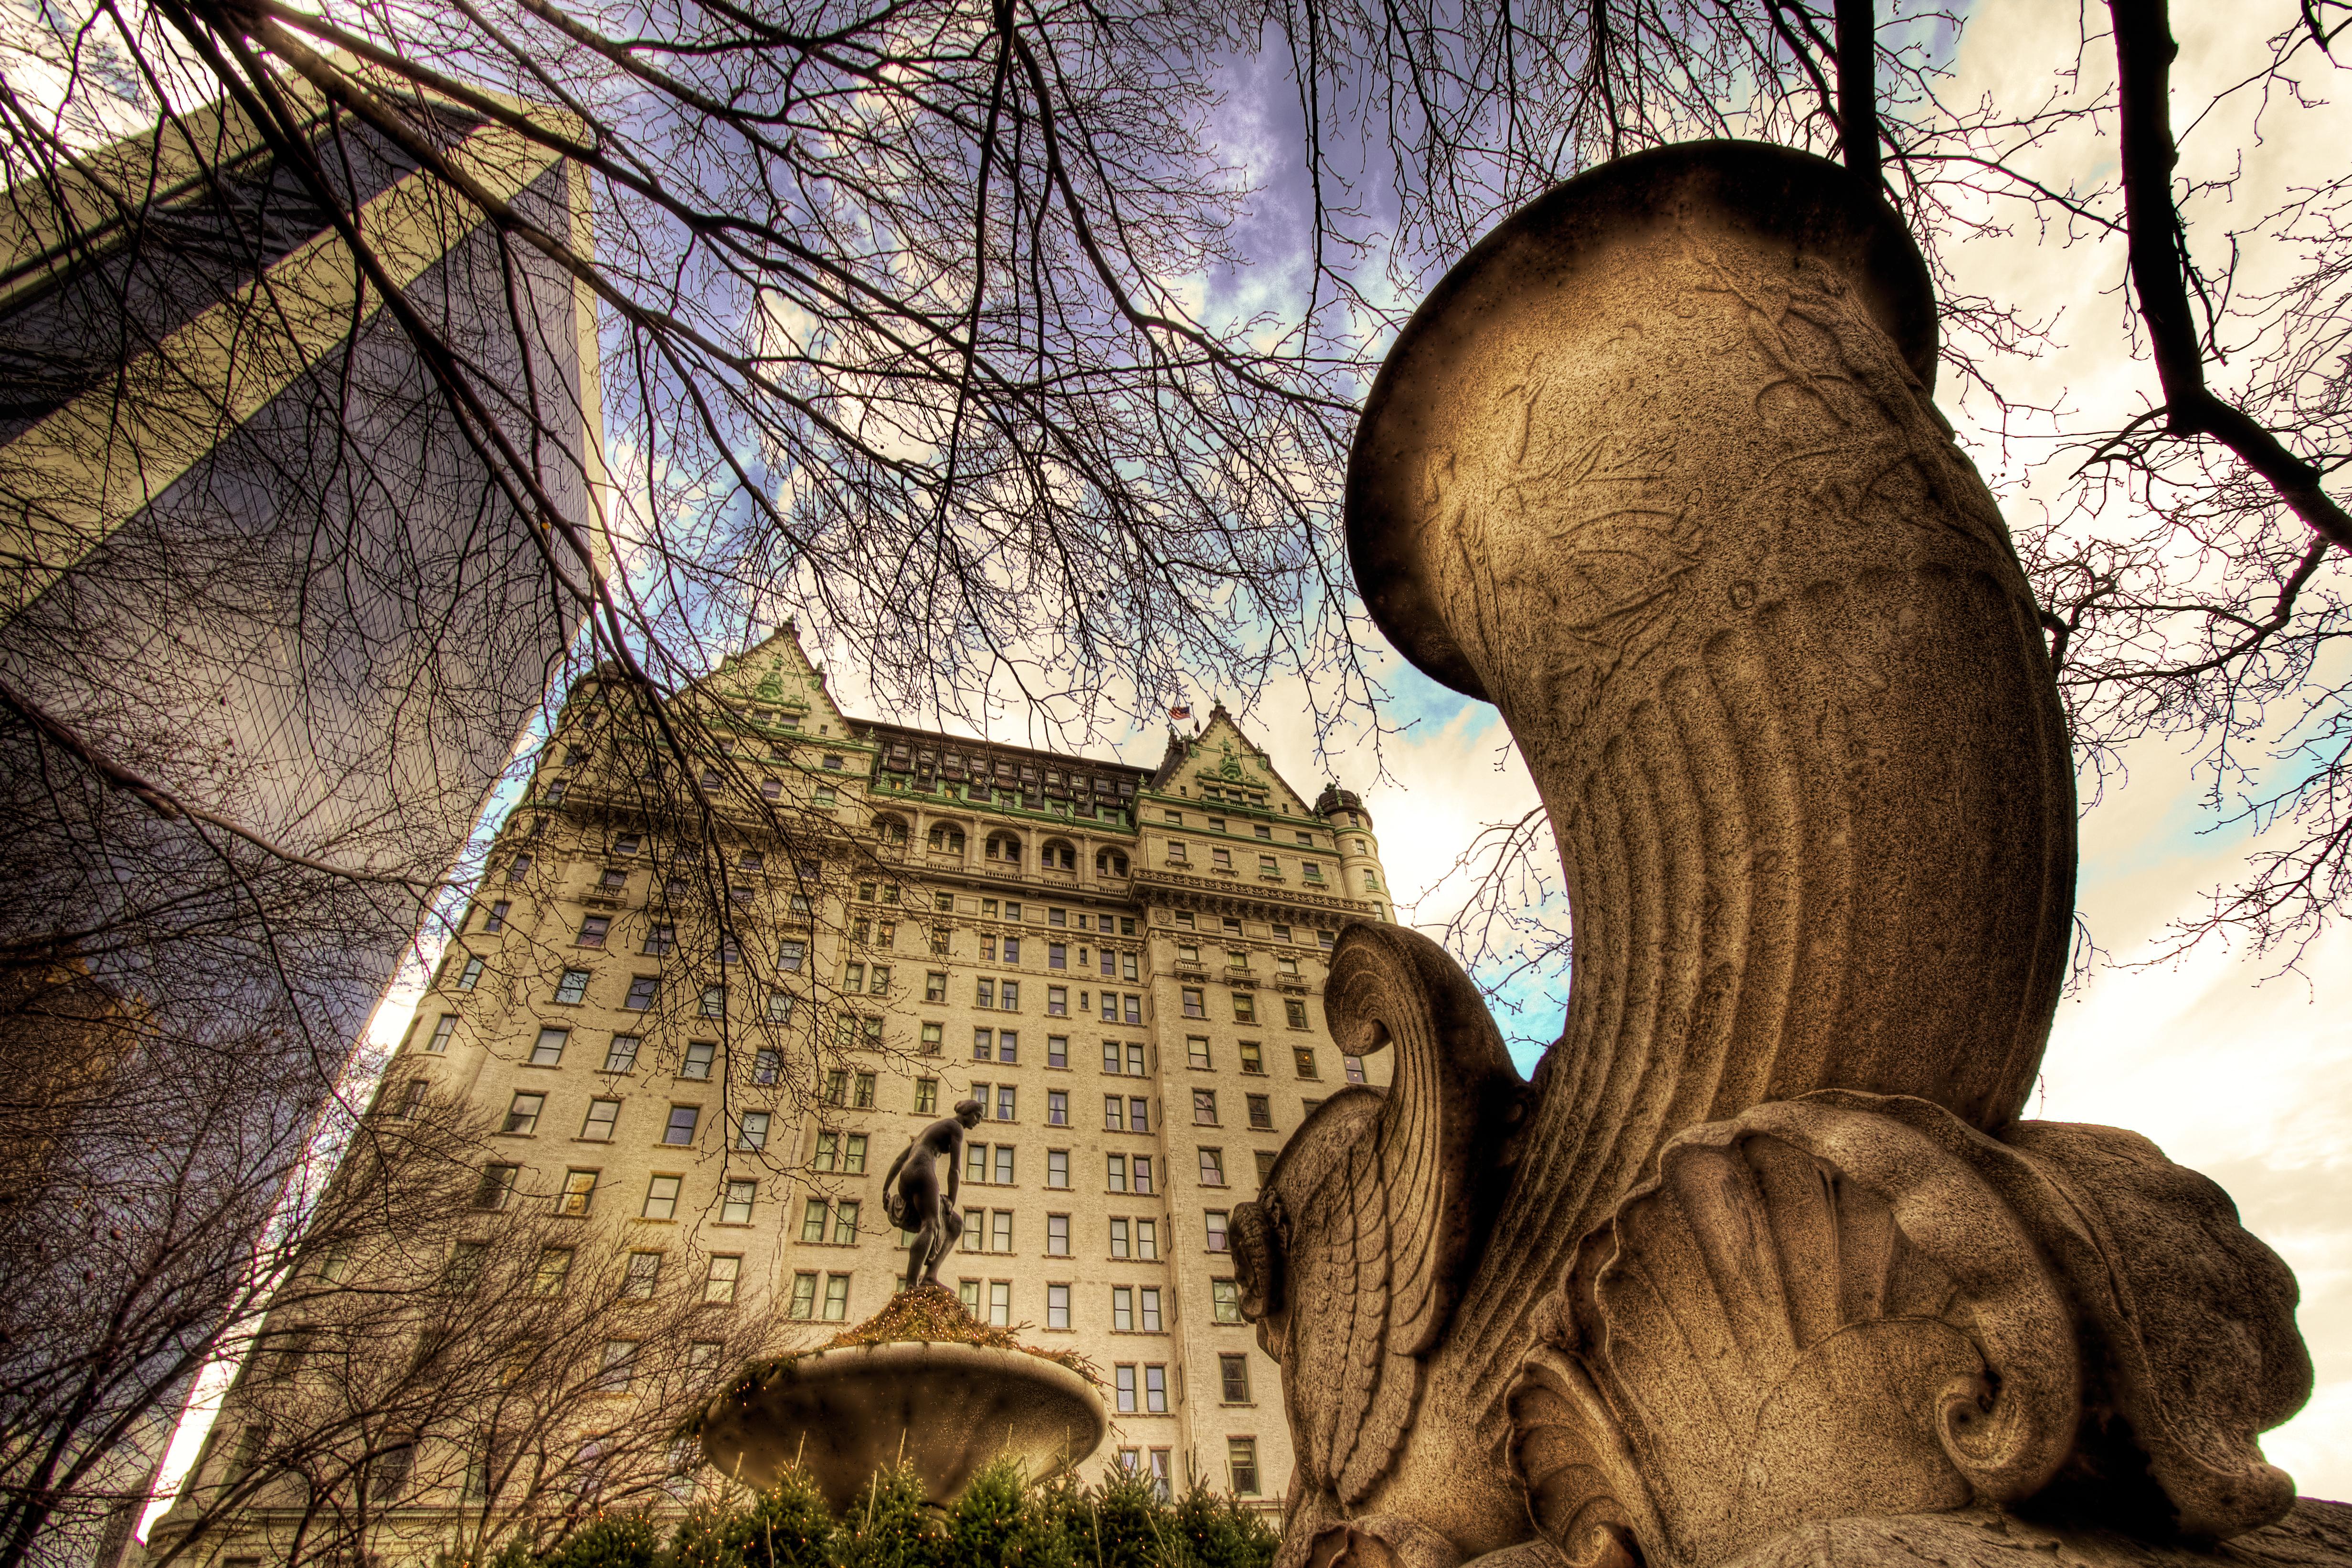 https://upload.wikimedia.org/wikipedia/commons/7/7a/The_Plaza_New_York.jpg